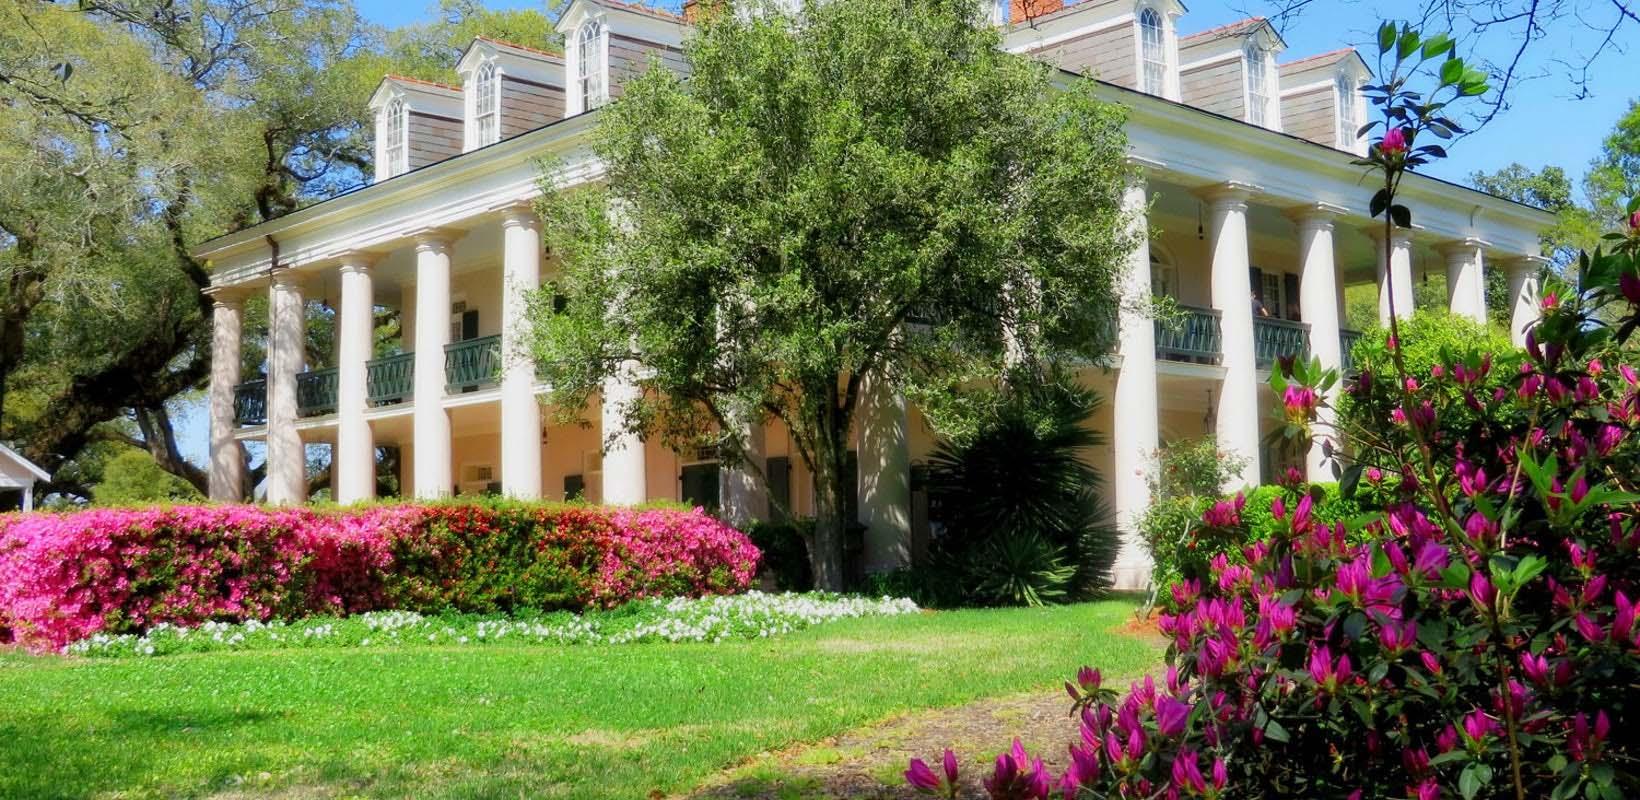 Louisiana plantation tour: Oak Alley and Laura